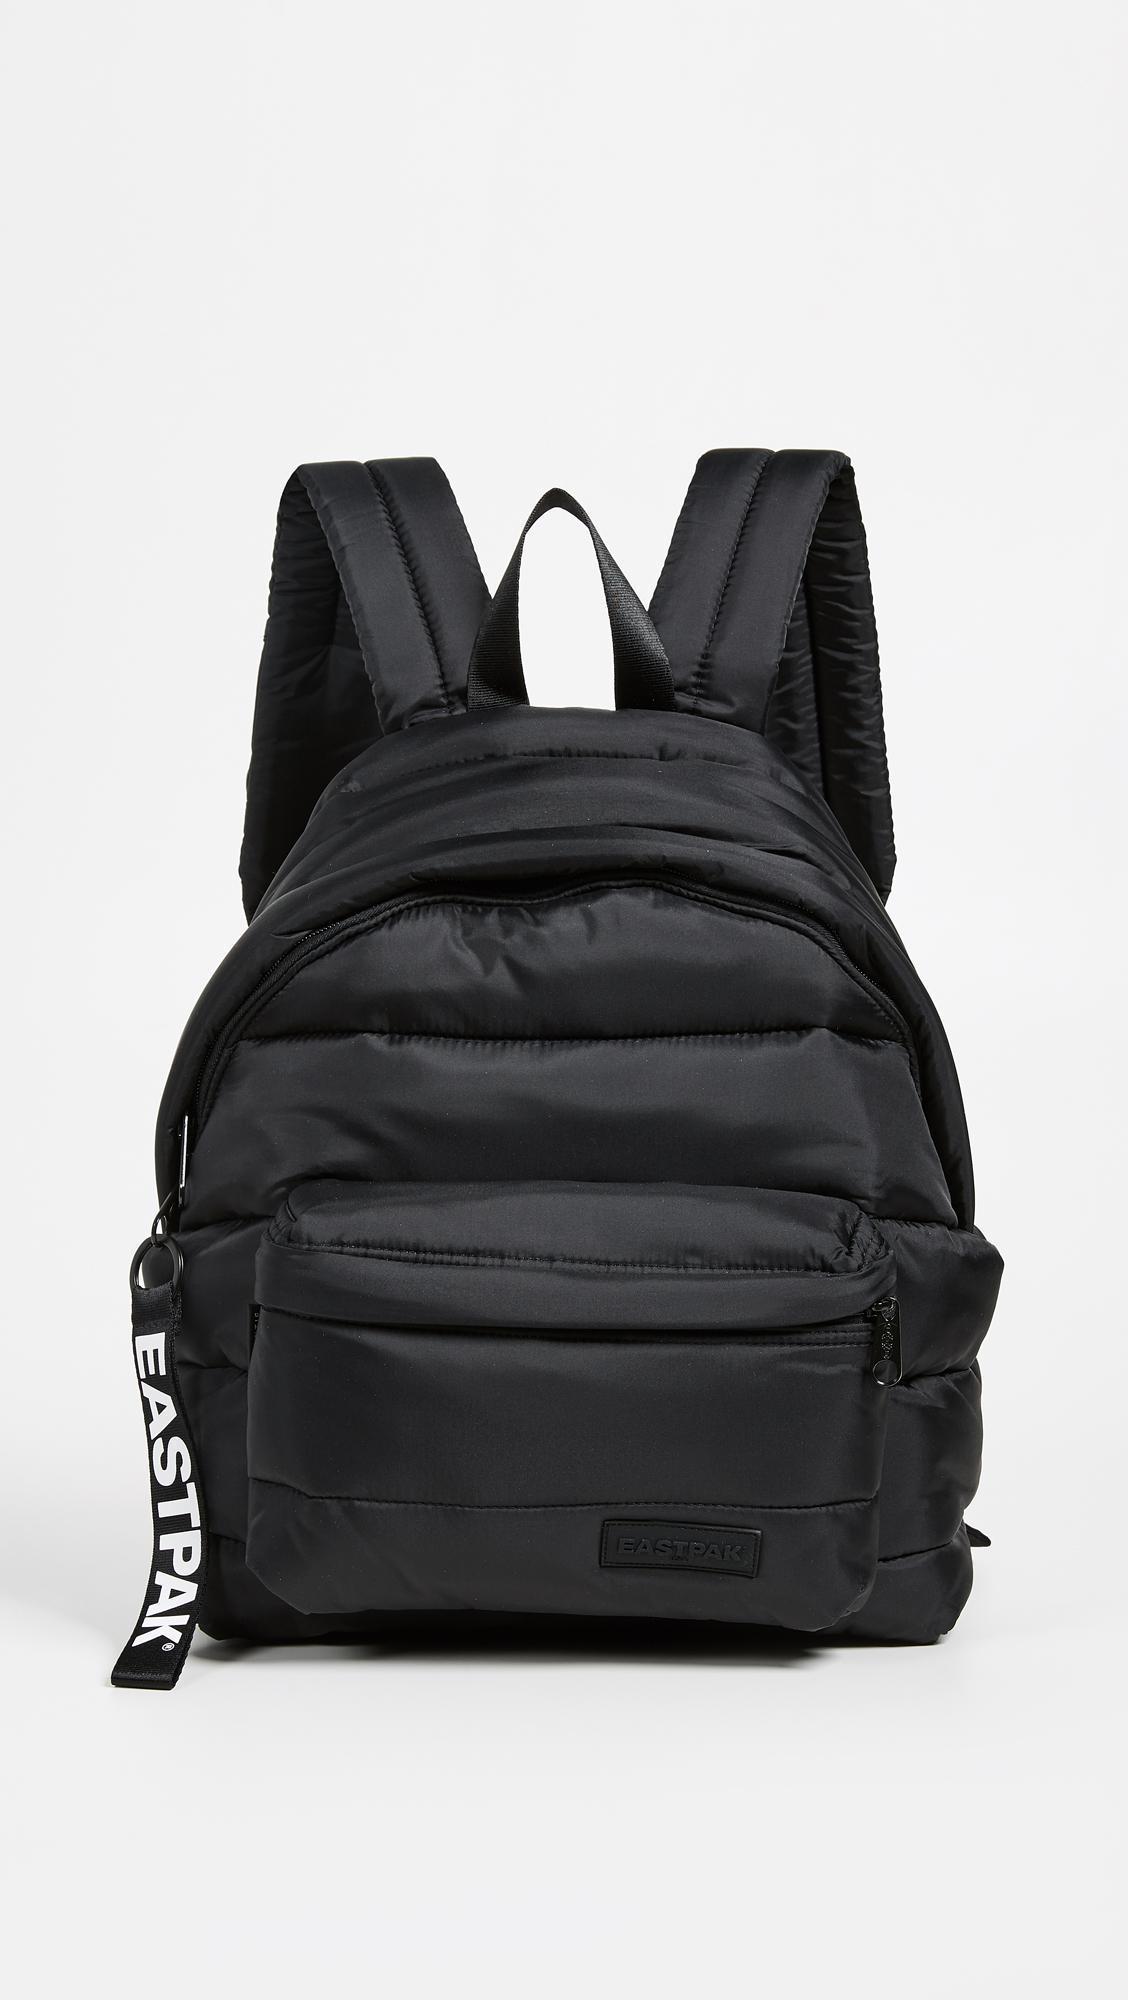 b77e71a65d Eastpak - Black Puffer Lab Padded Pak'r Backpack - Lyst. View fullscreen